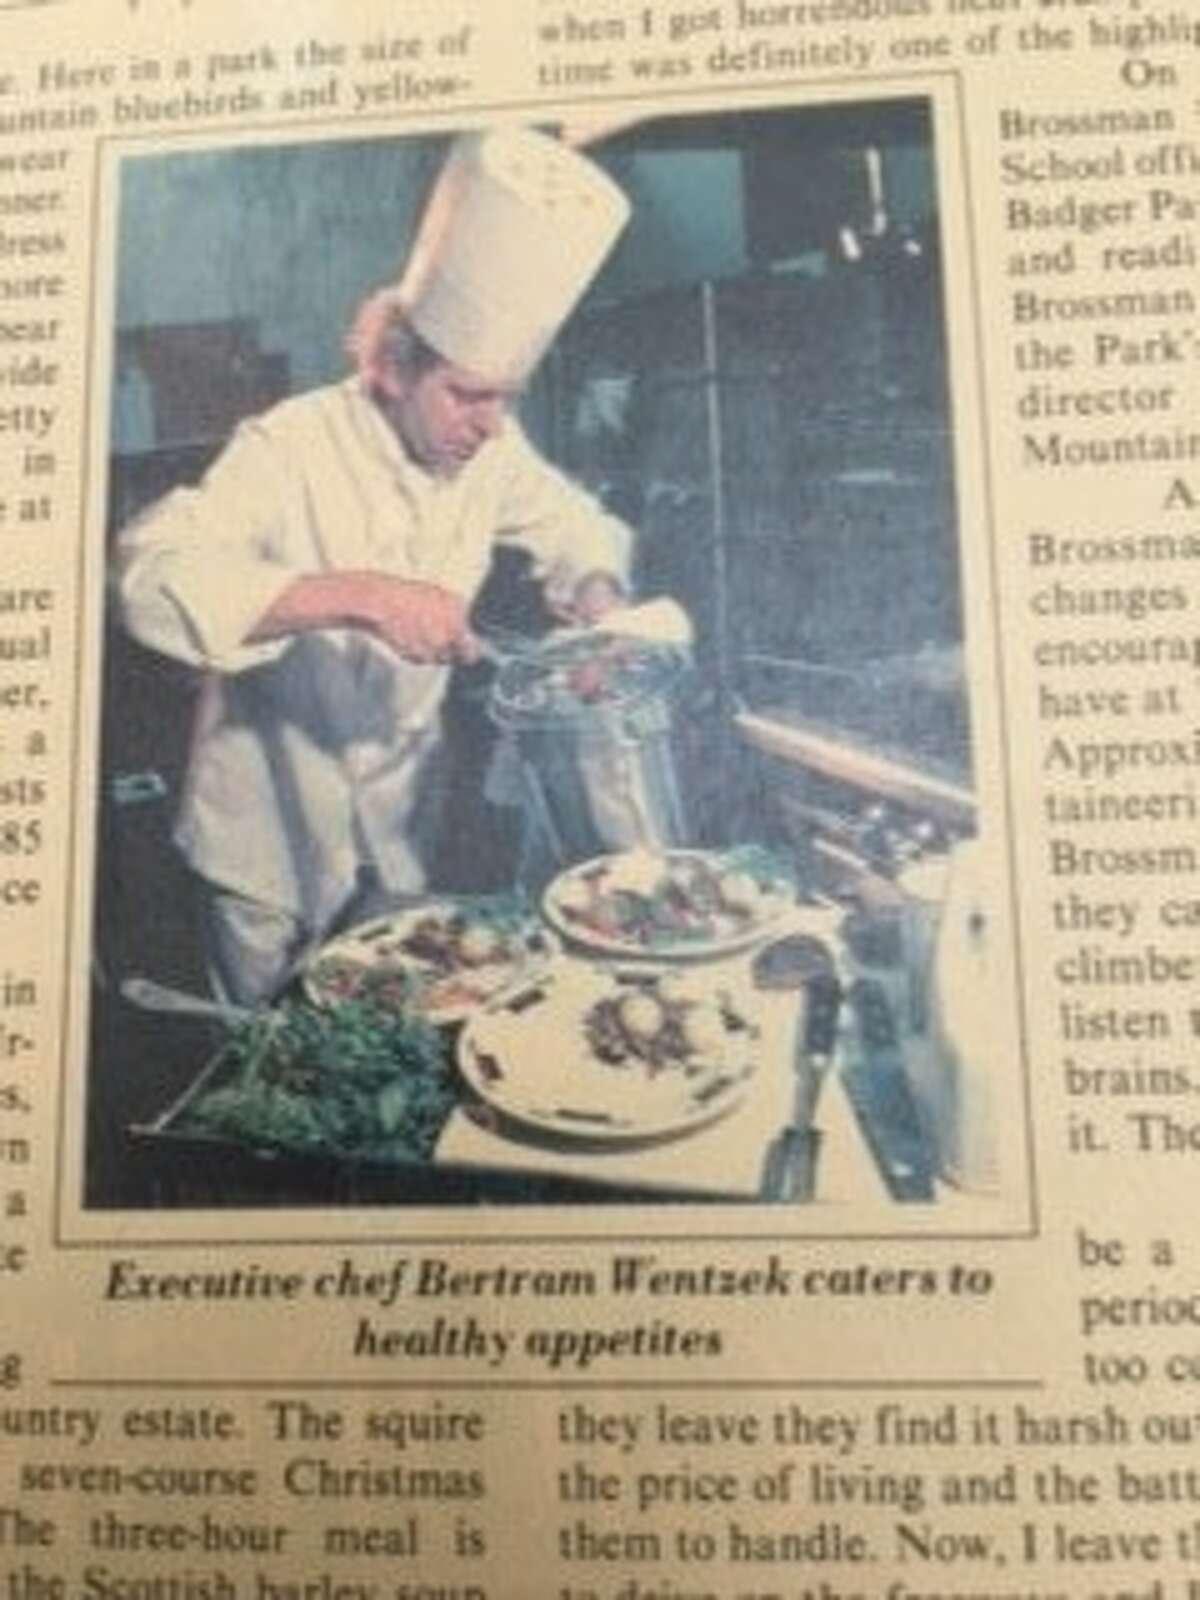 Chef Wentzek in the news.